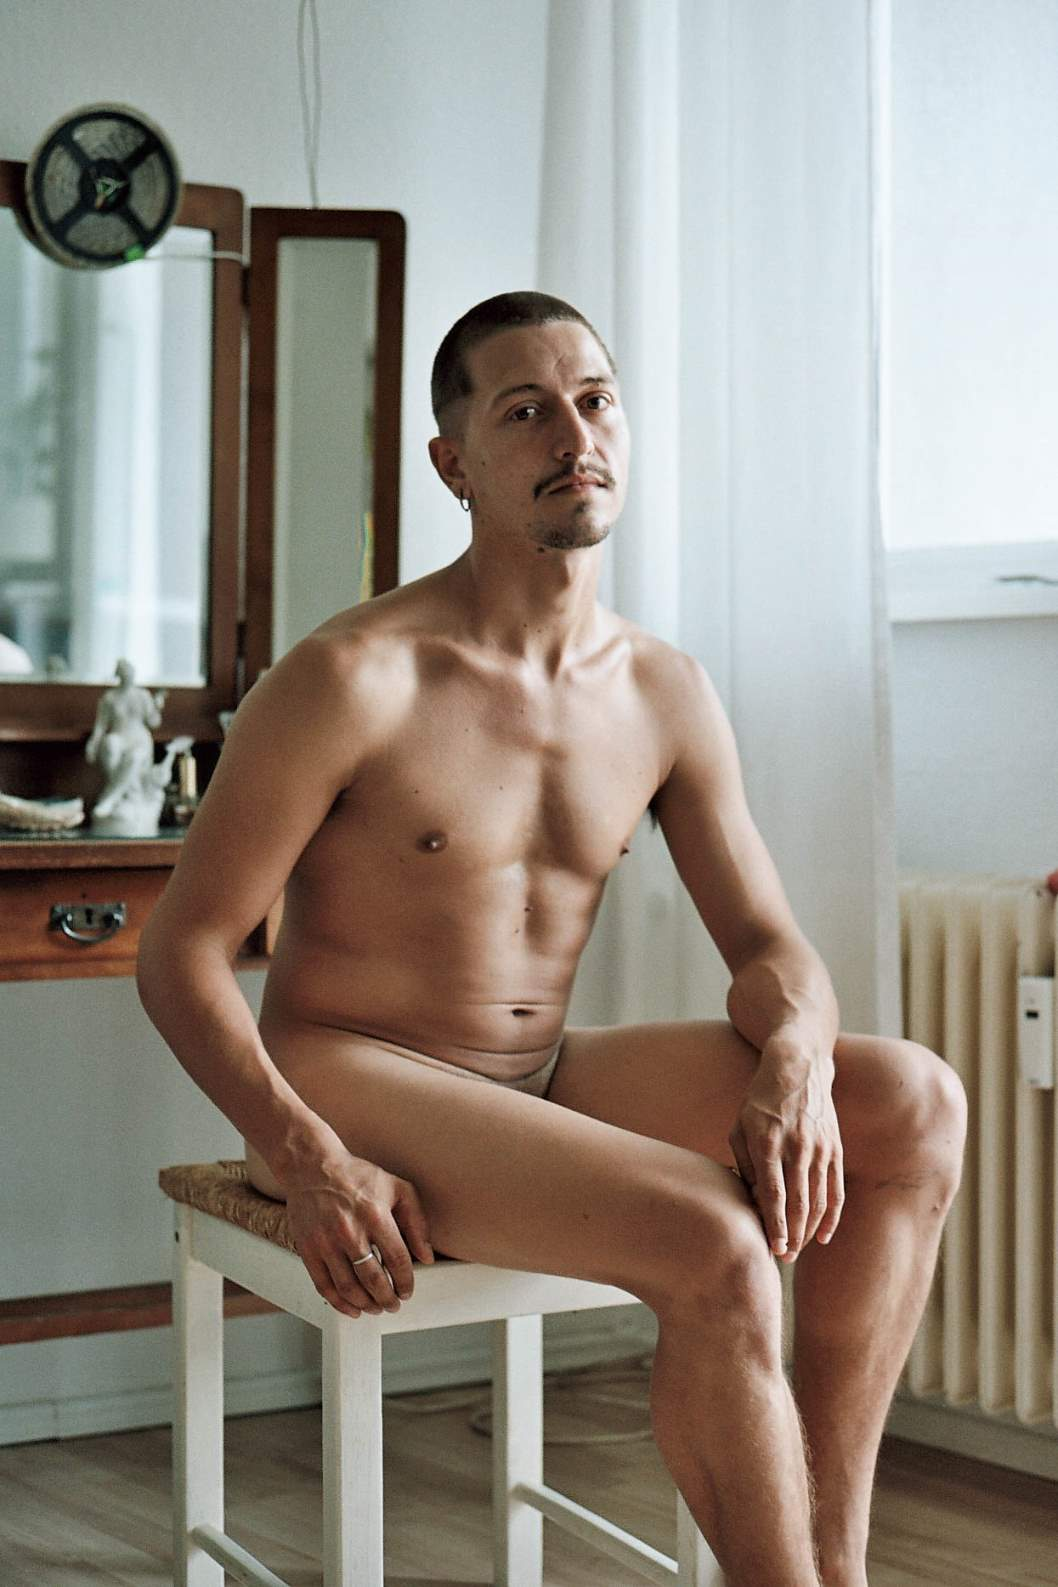 Valentin from Berlin